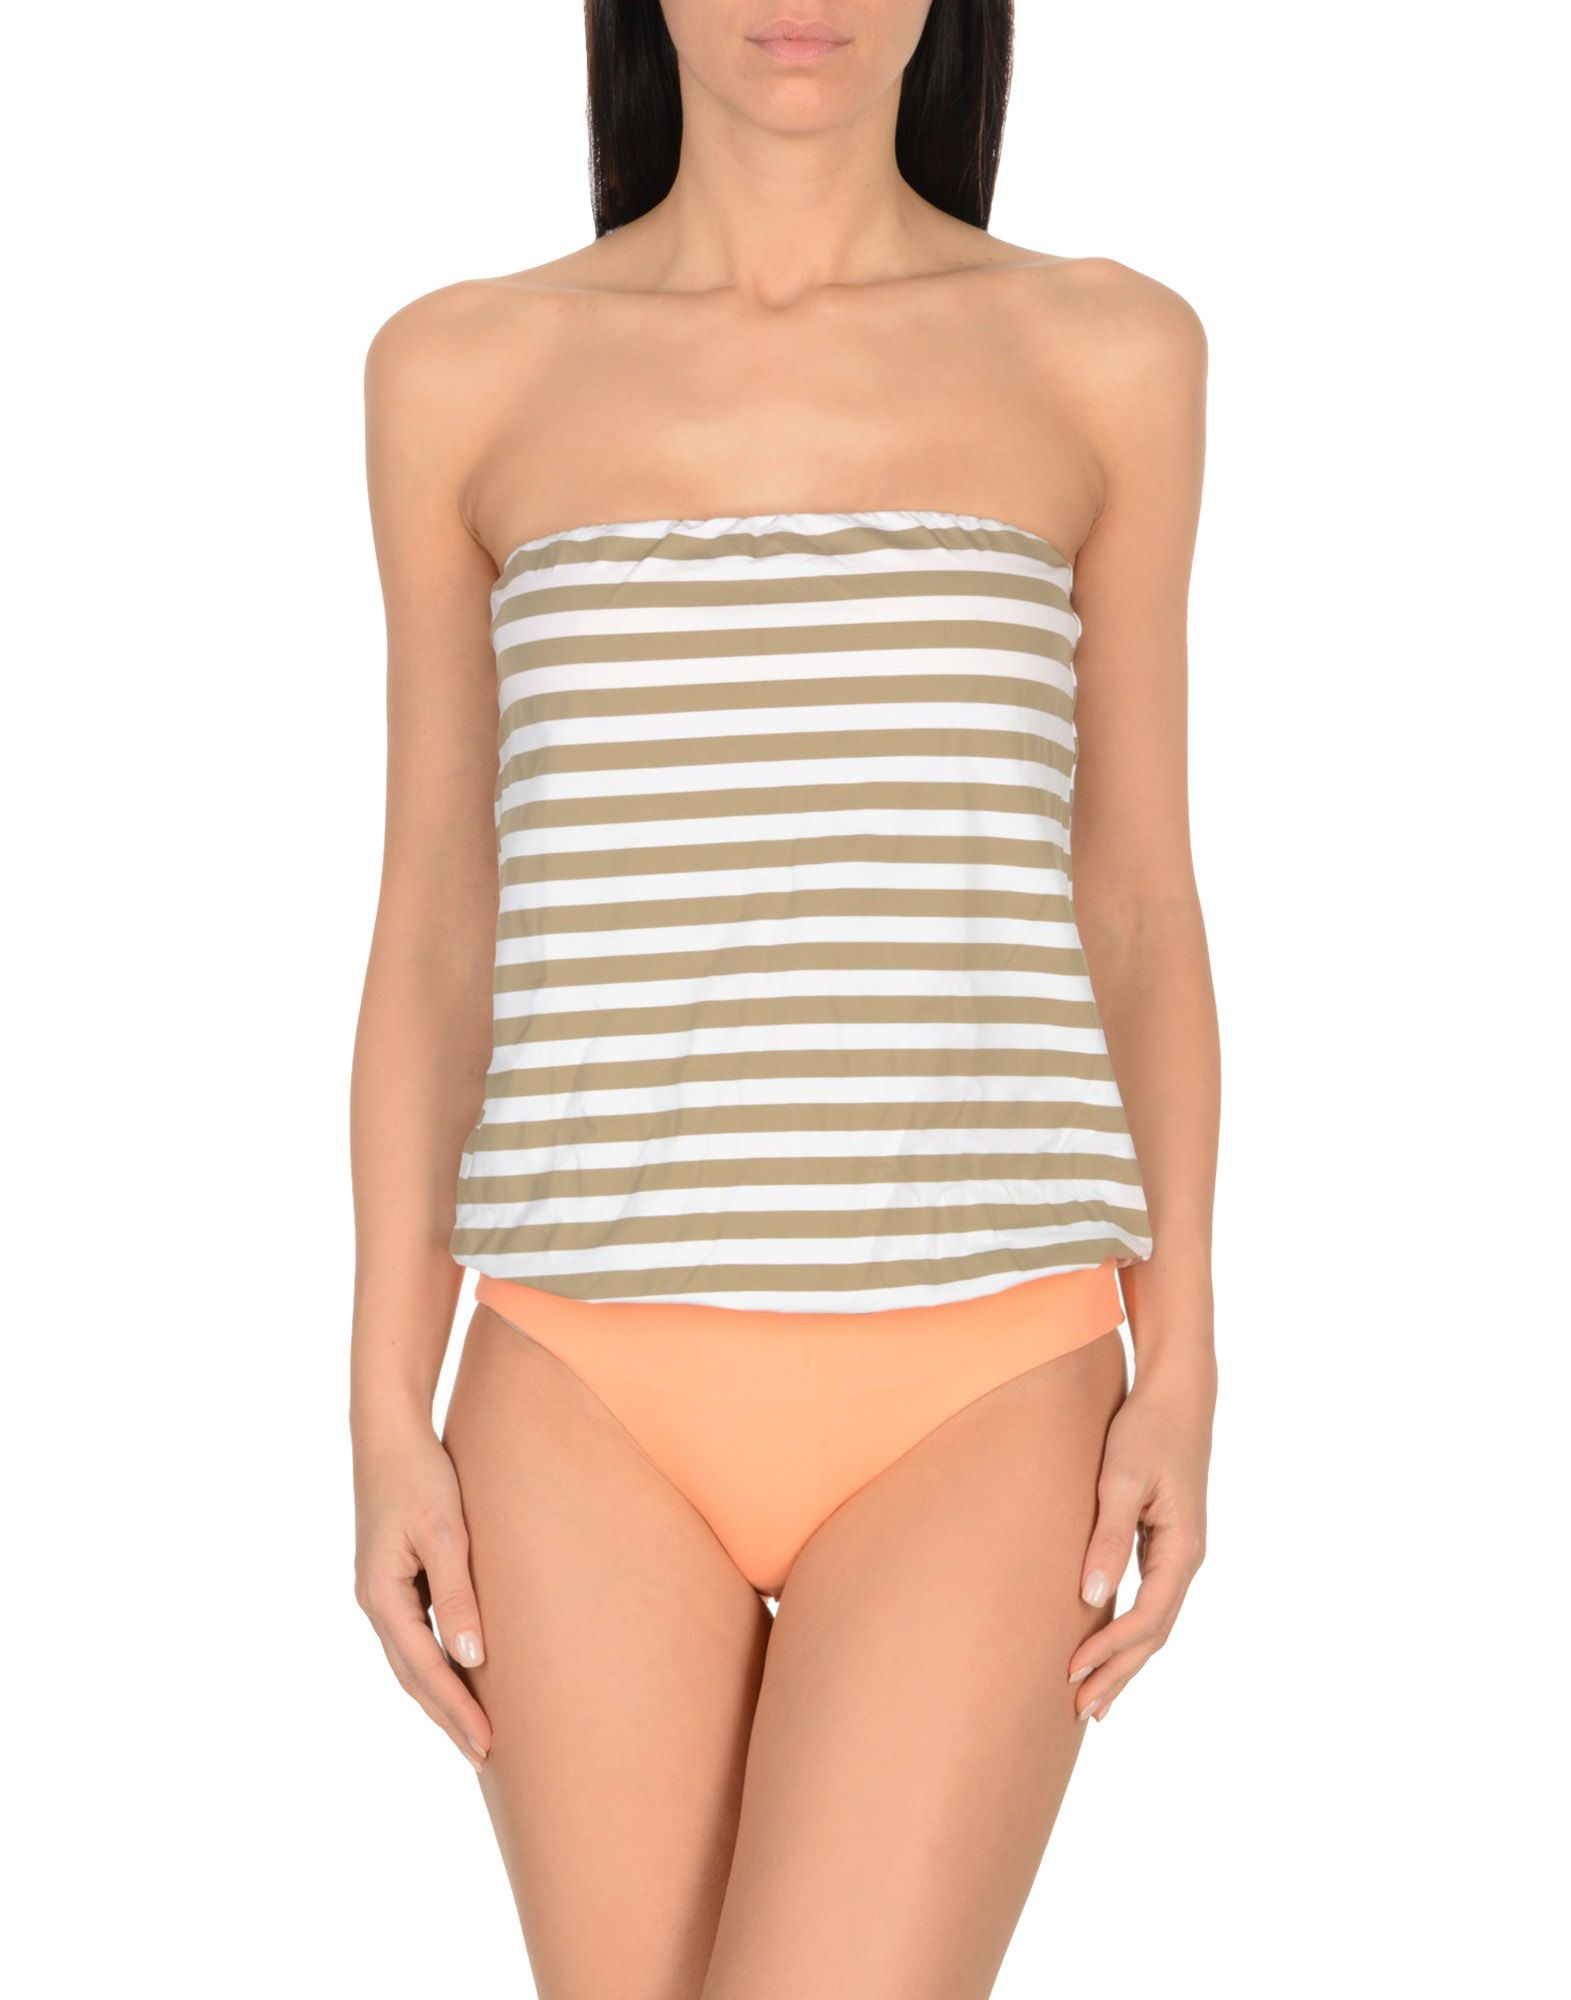 ALBERTINE One-Piece Swimsuits in Khaki